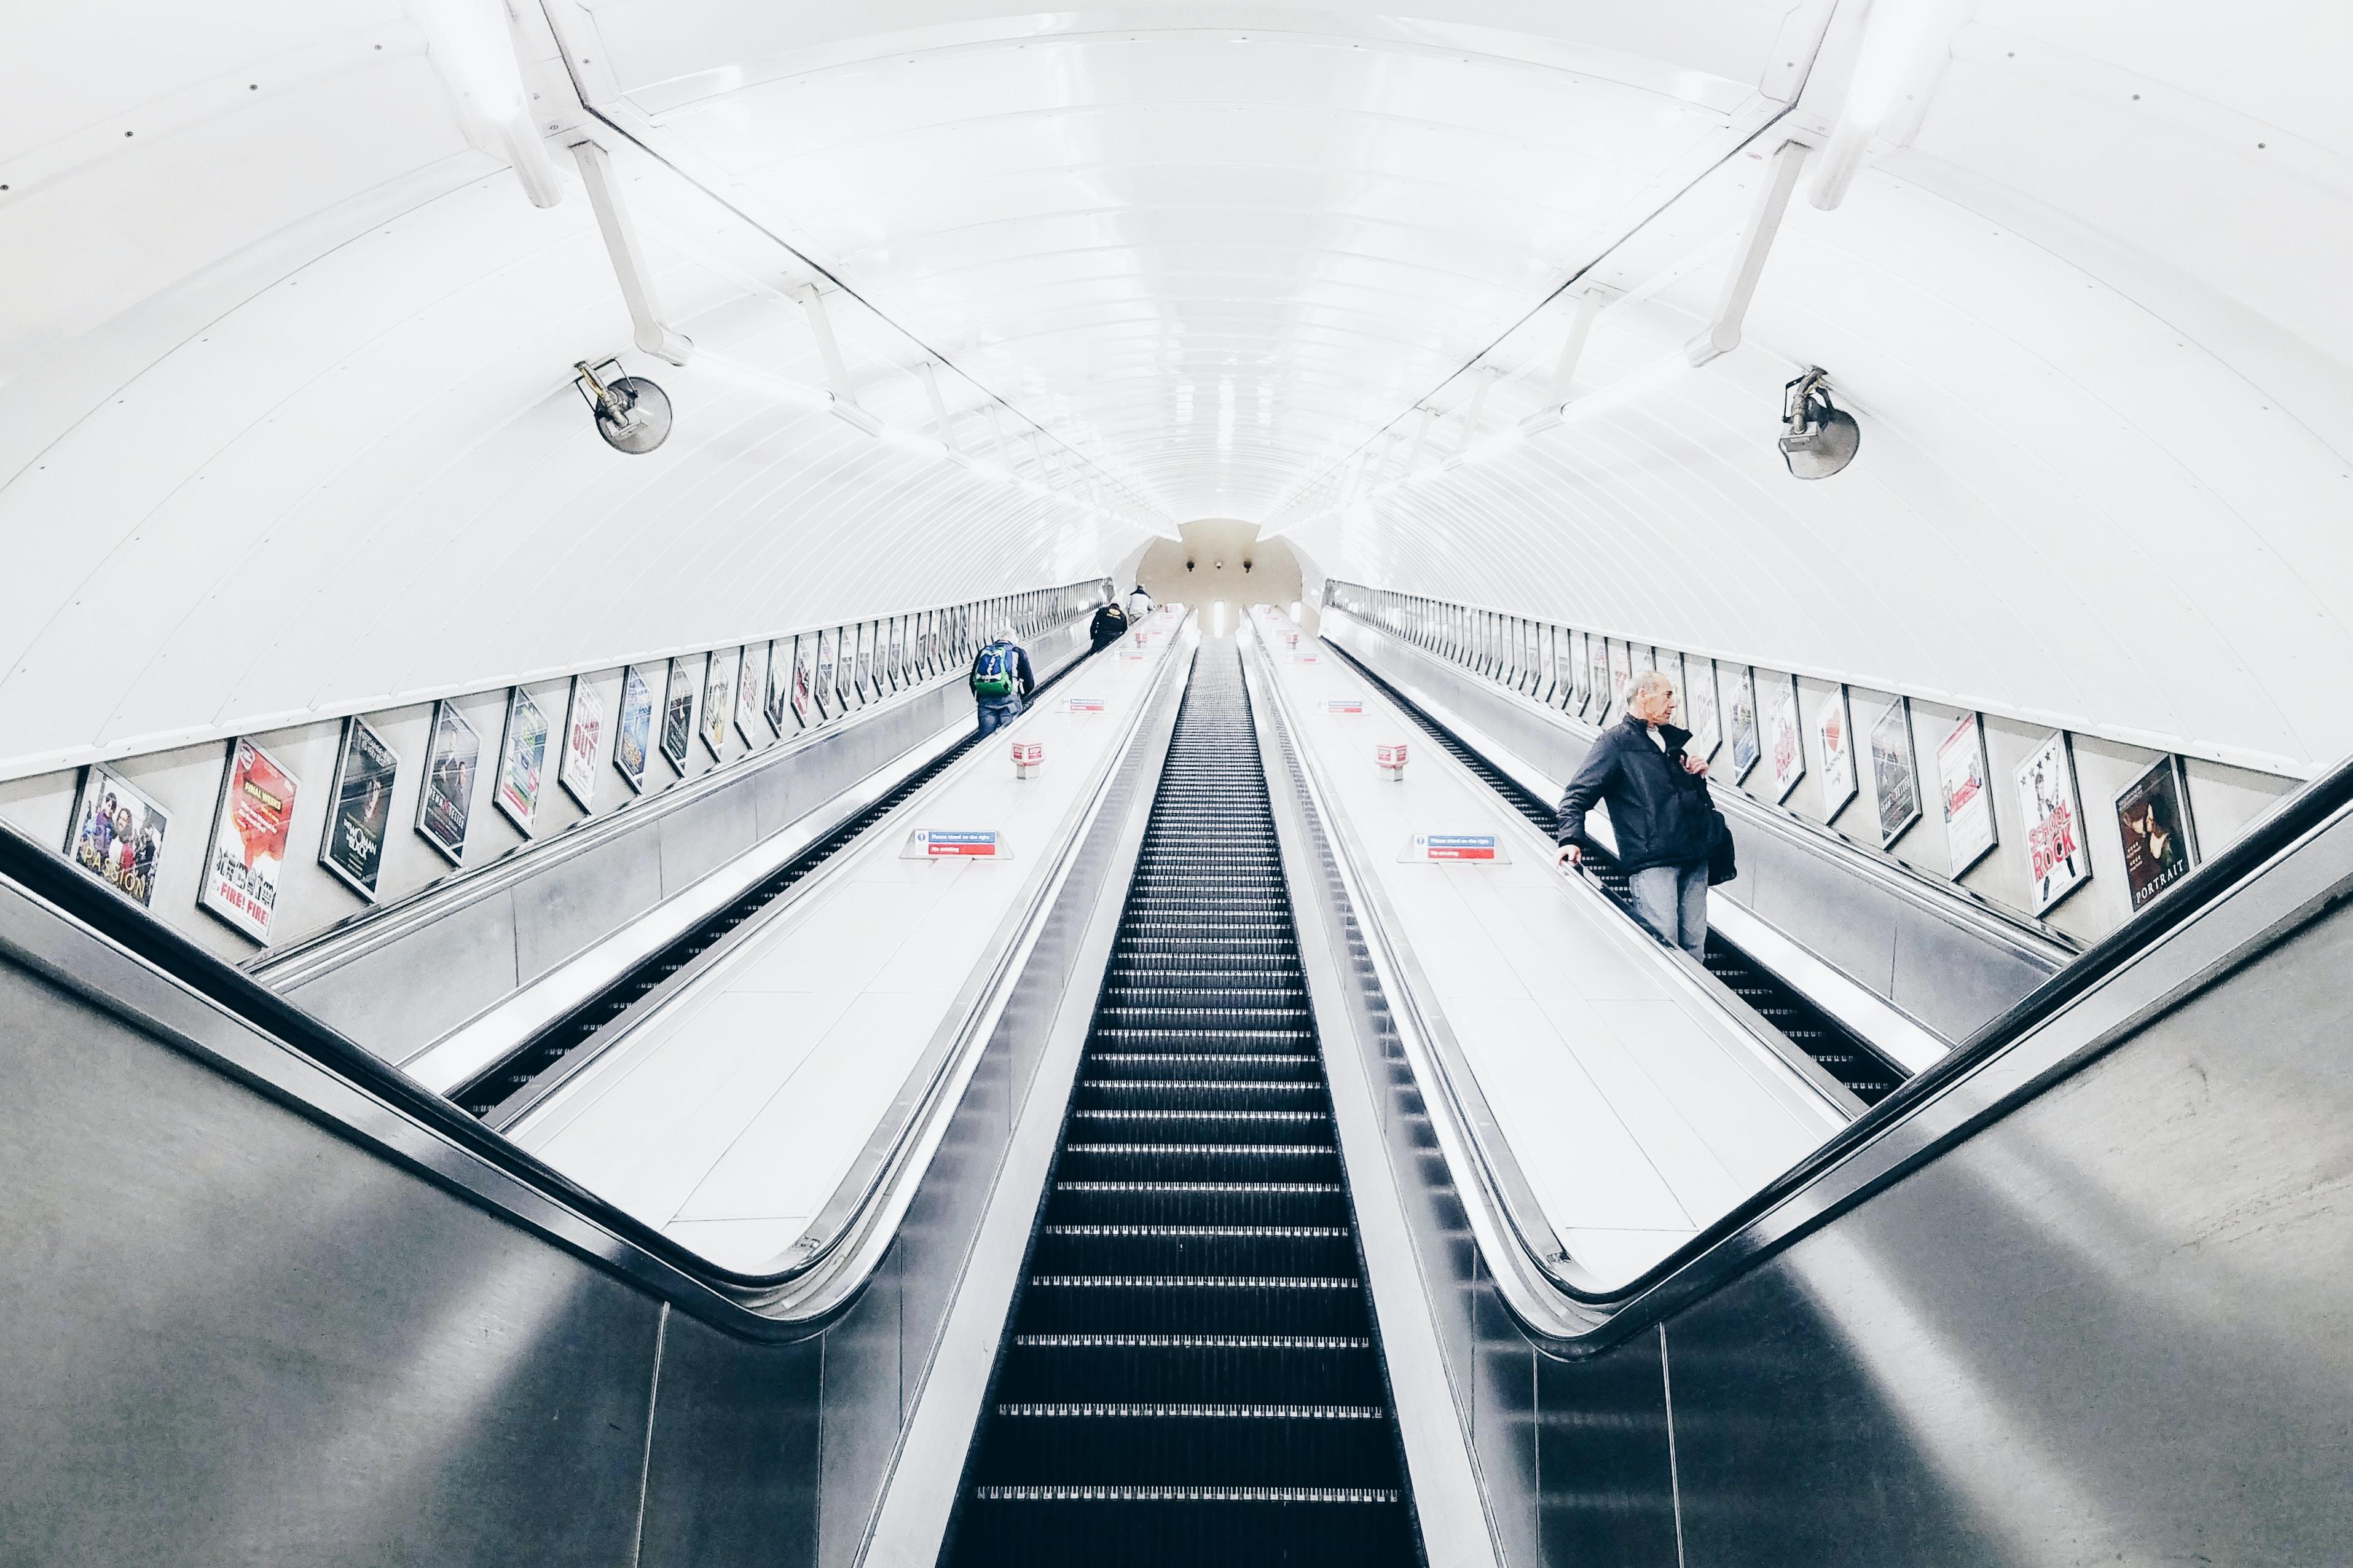 people riding escalator inside white room